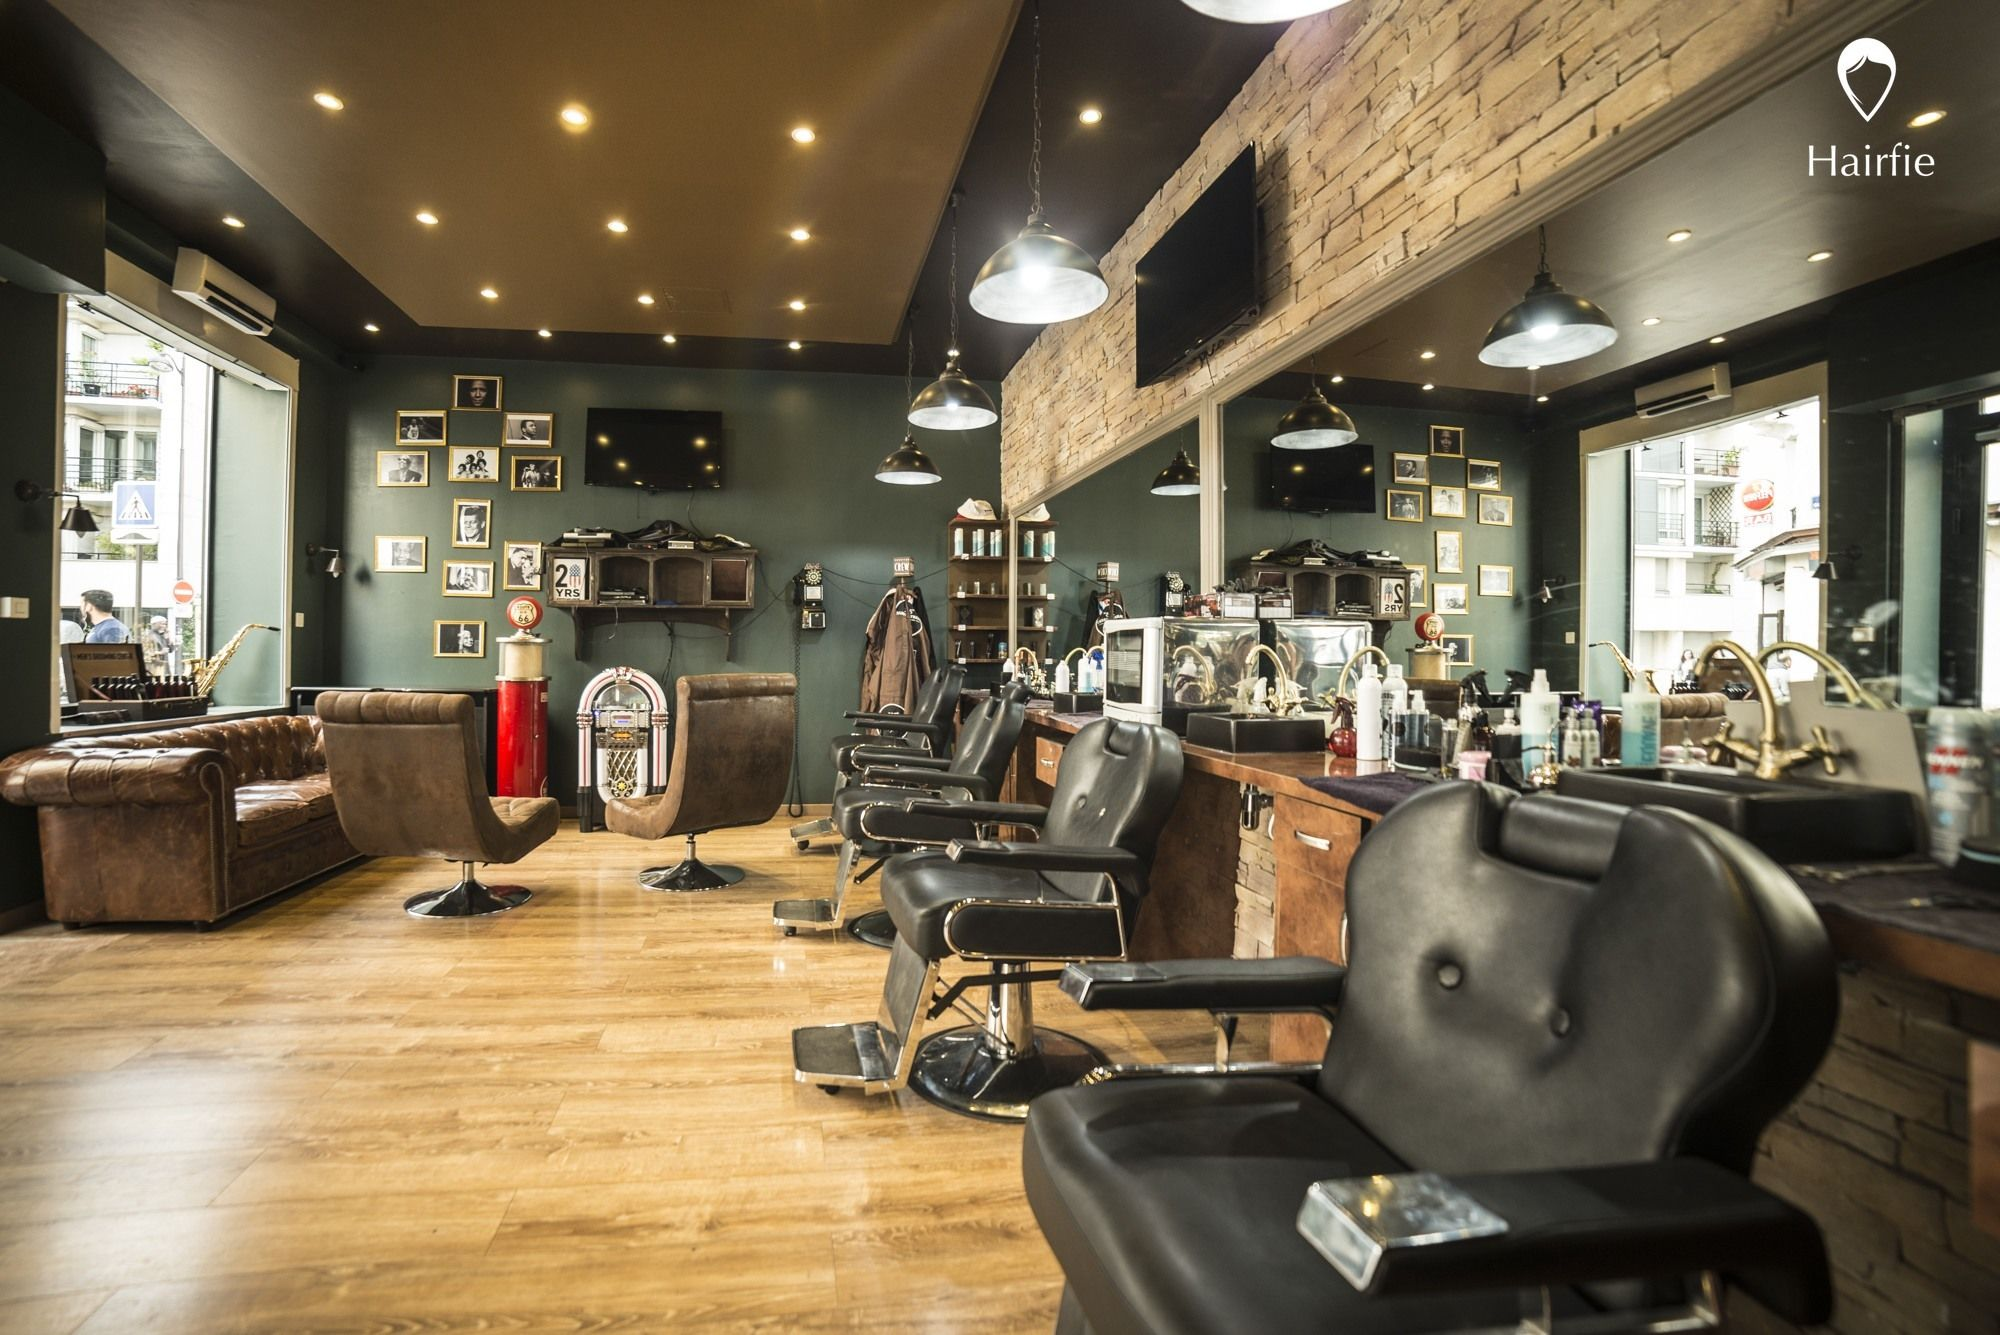 deco vintage salon de coiffure. Black Bedroom Furniture Sets. Home Design Ideas